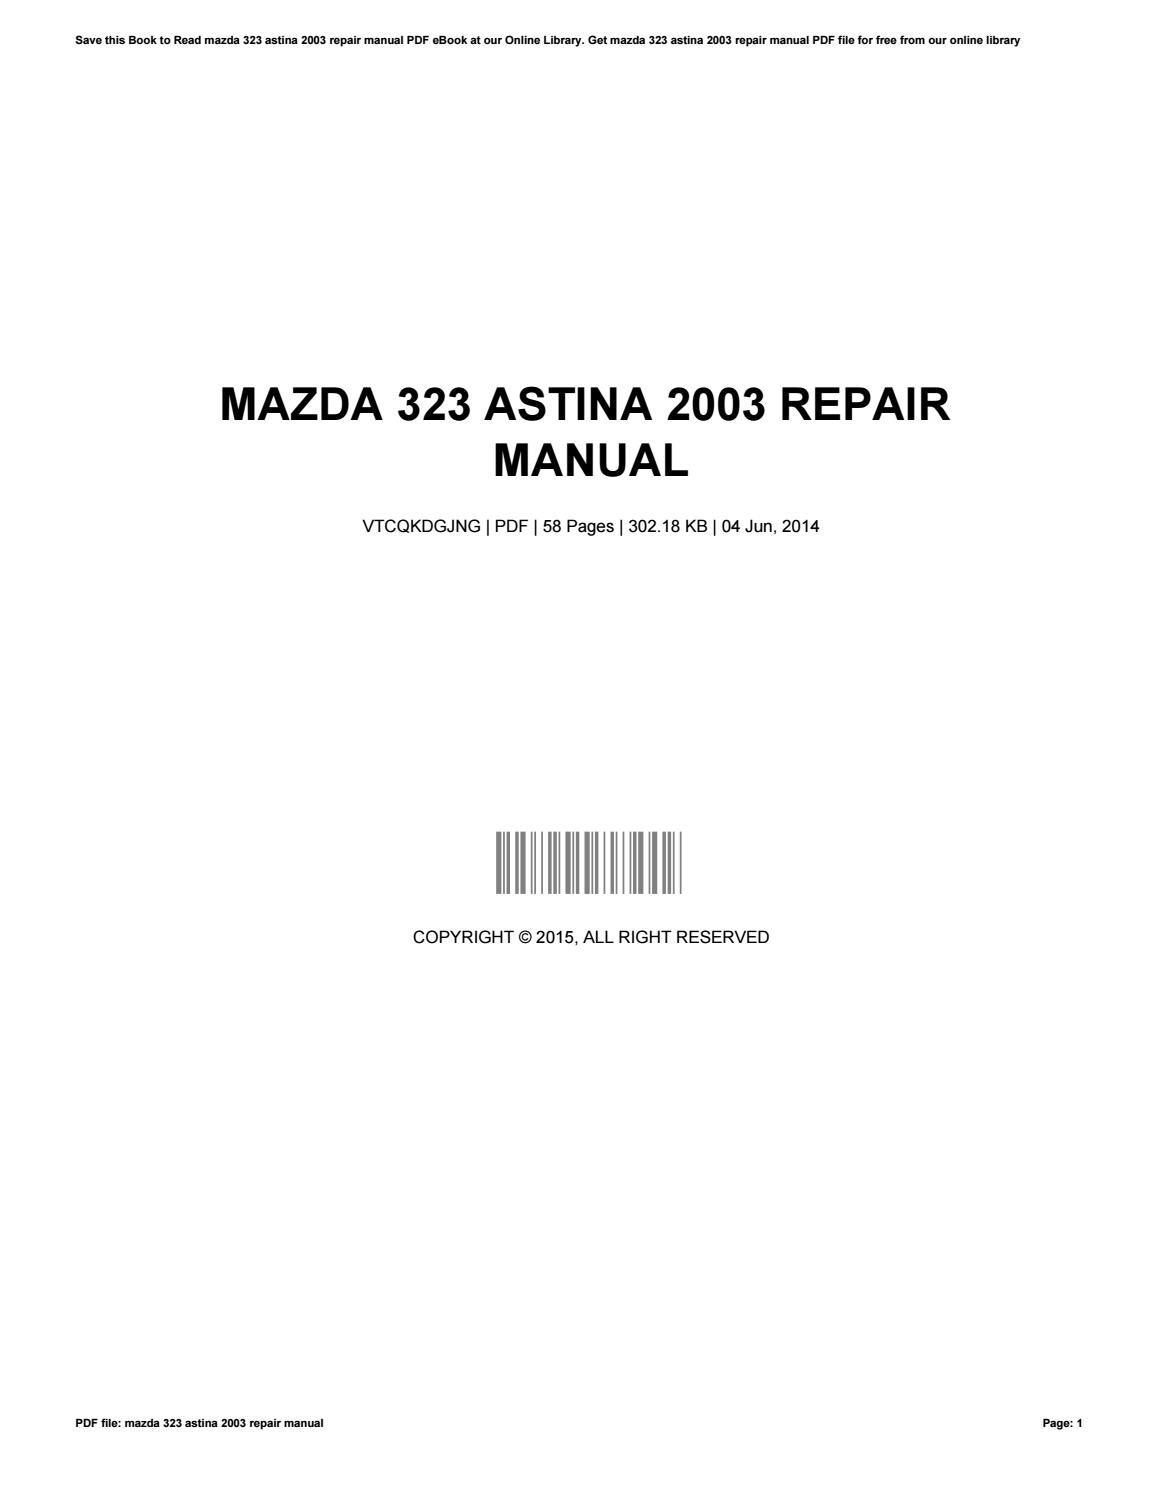 mazda 323 astina 2003 manual